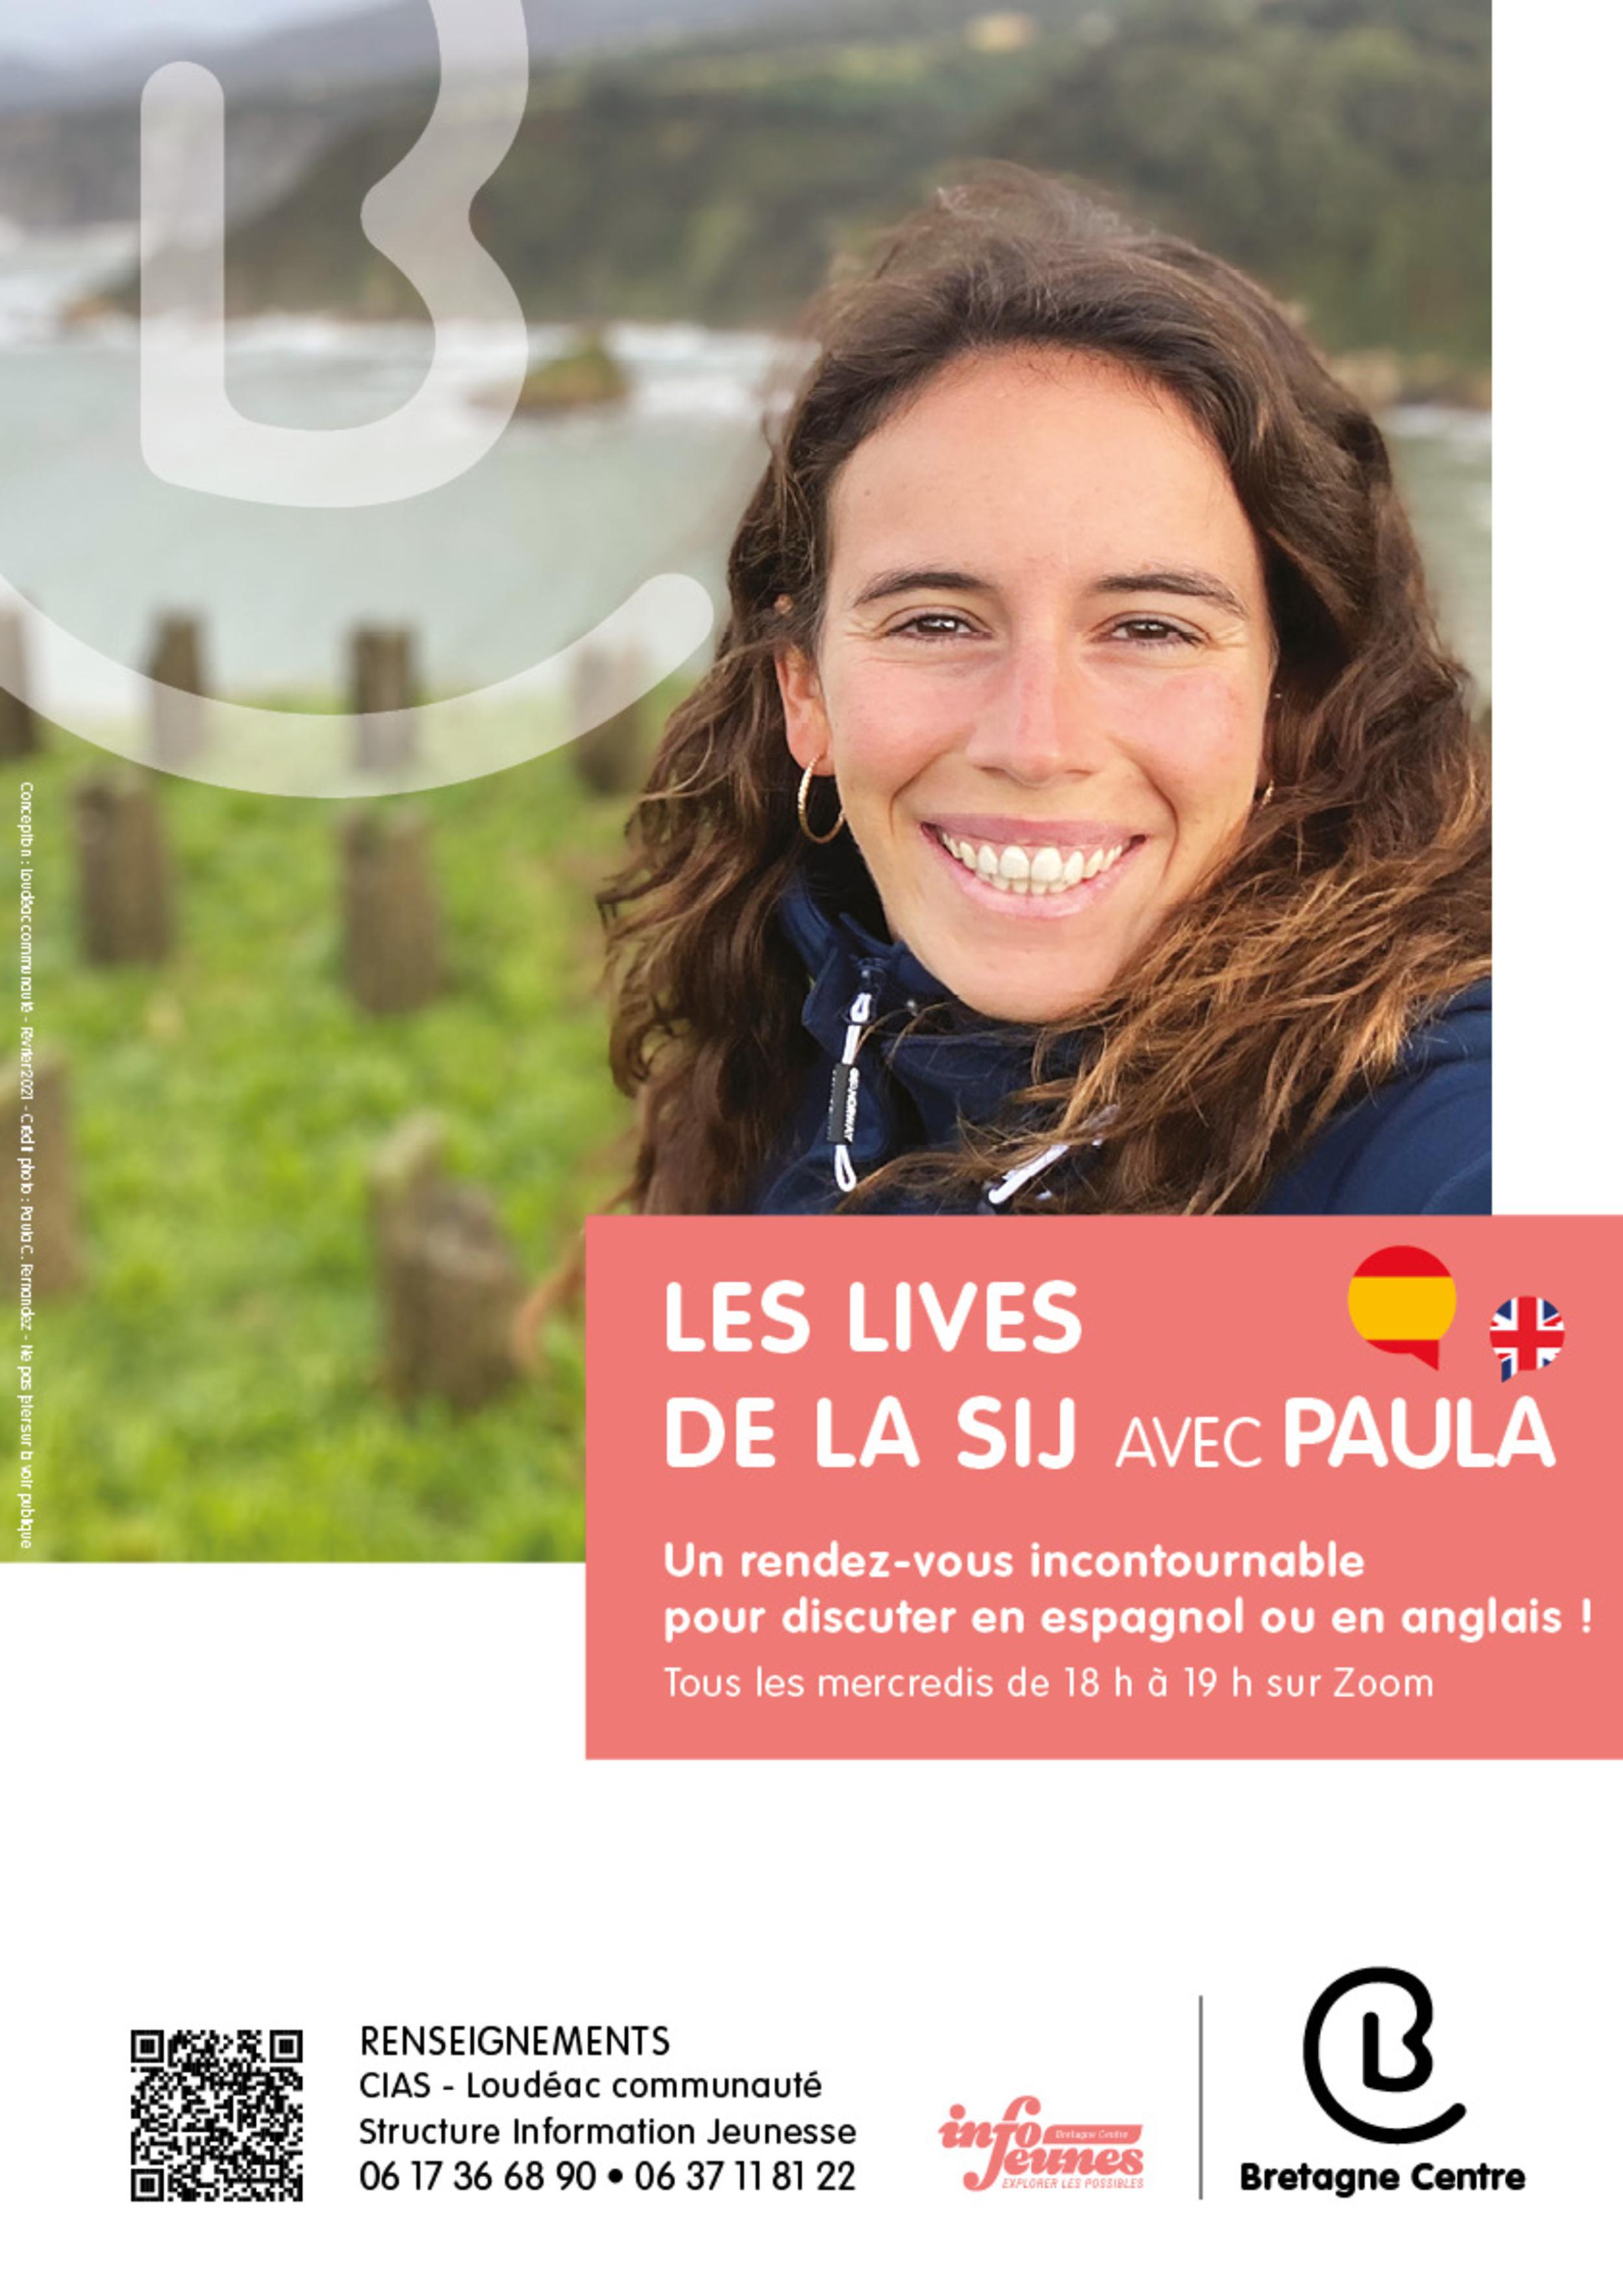 11-25 ans : Live en Anglais ou en Italien